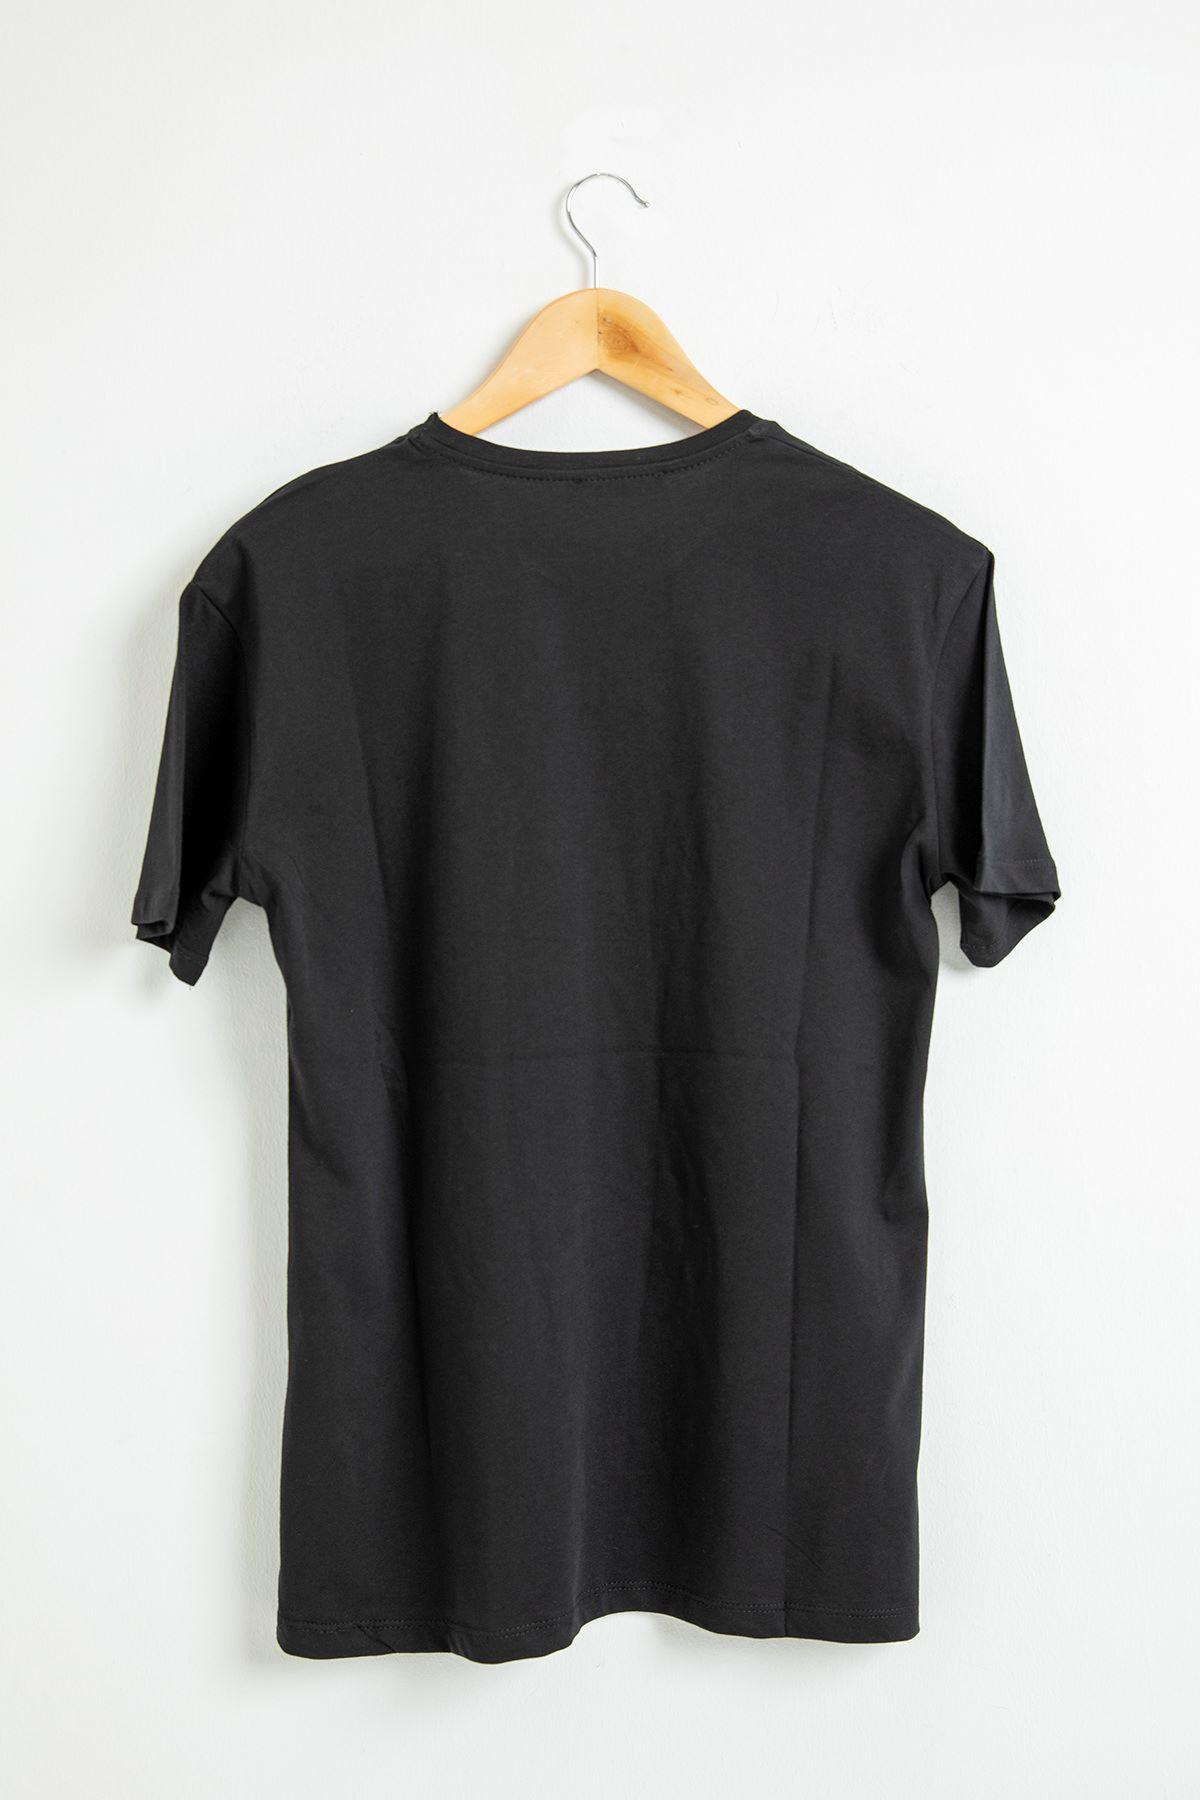 Kız Figürlü Salaş T-Shirt-Siyah